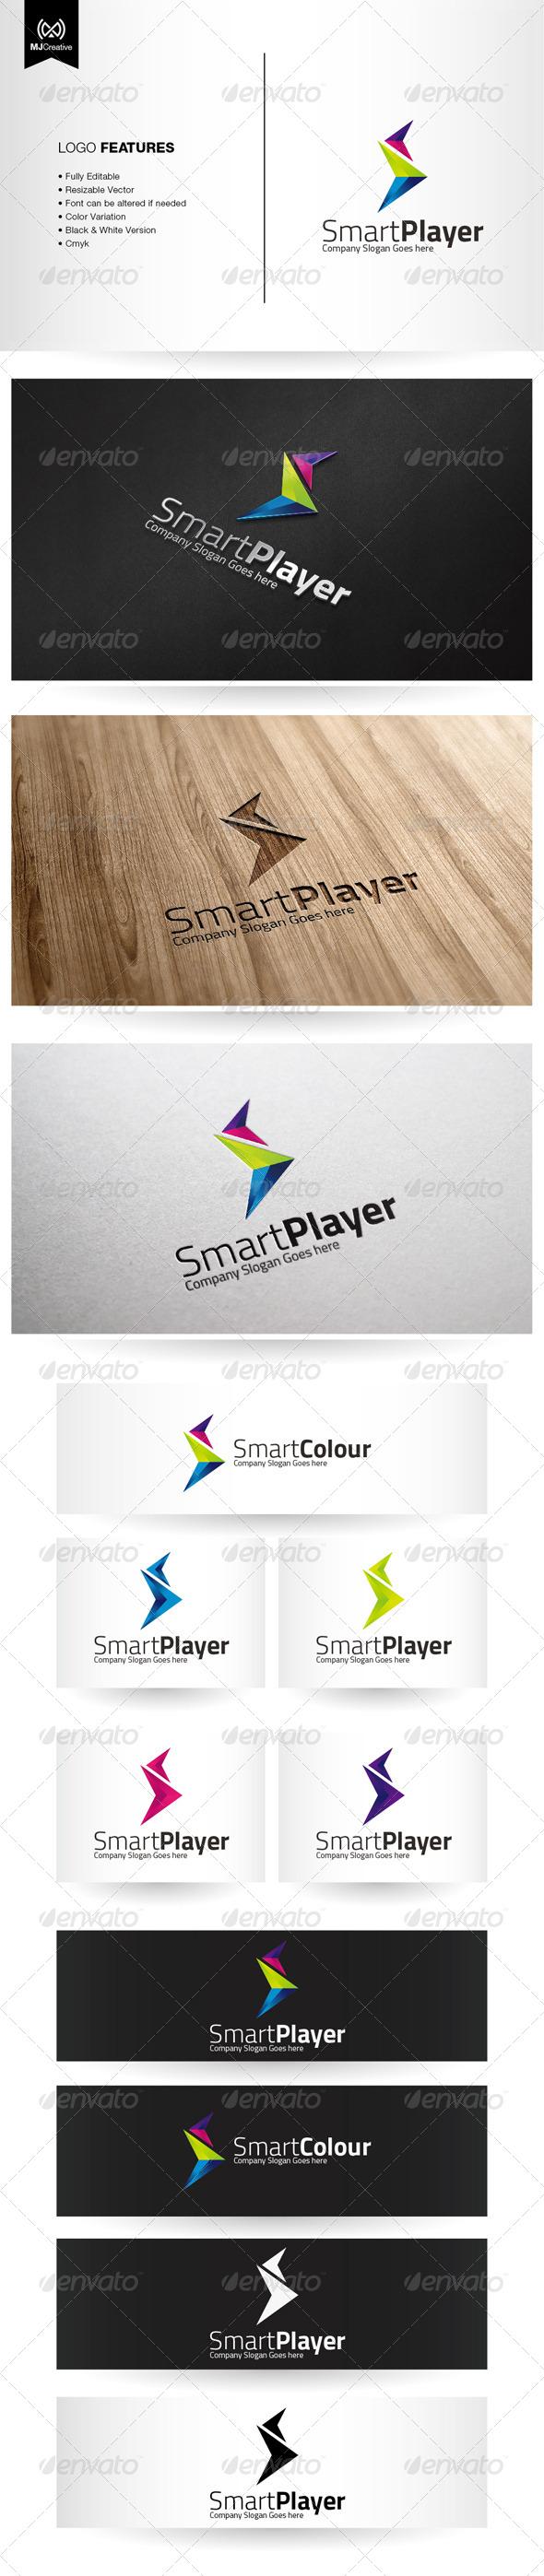 Abstract S and Play Forward Logo